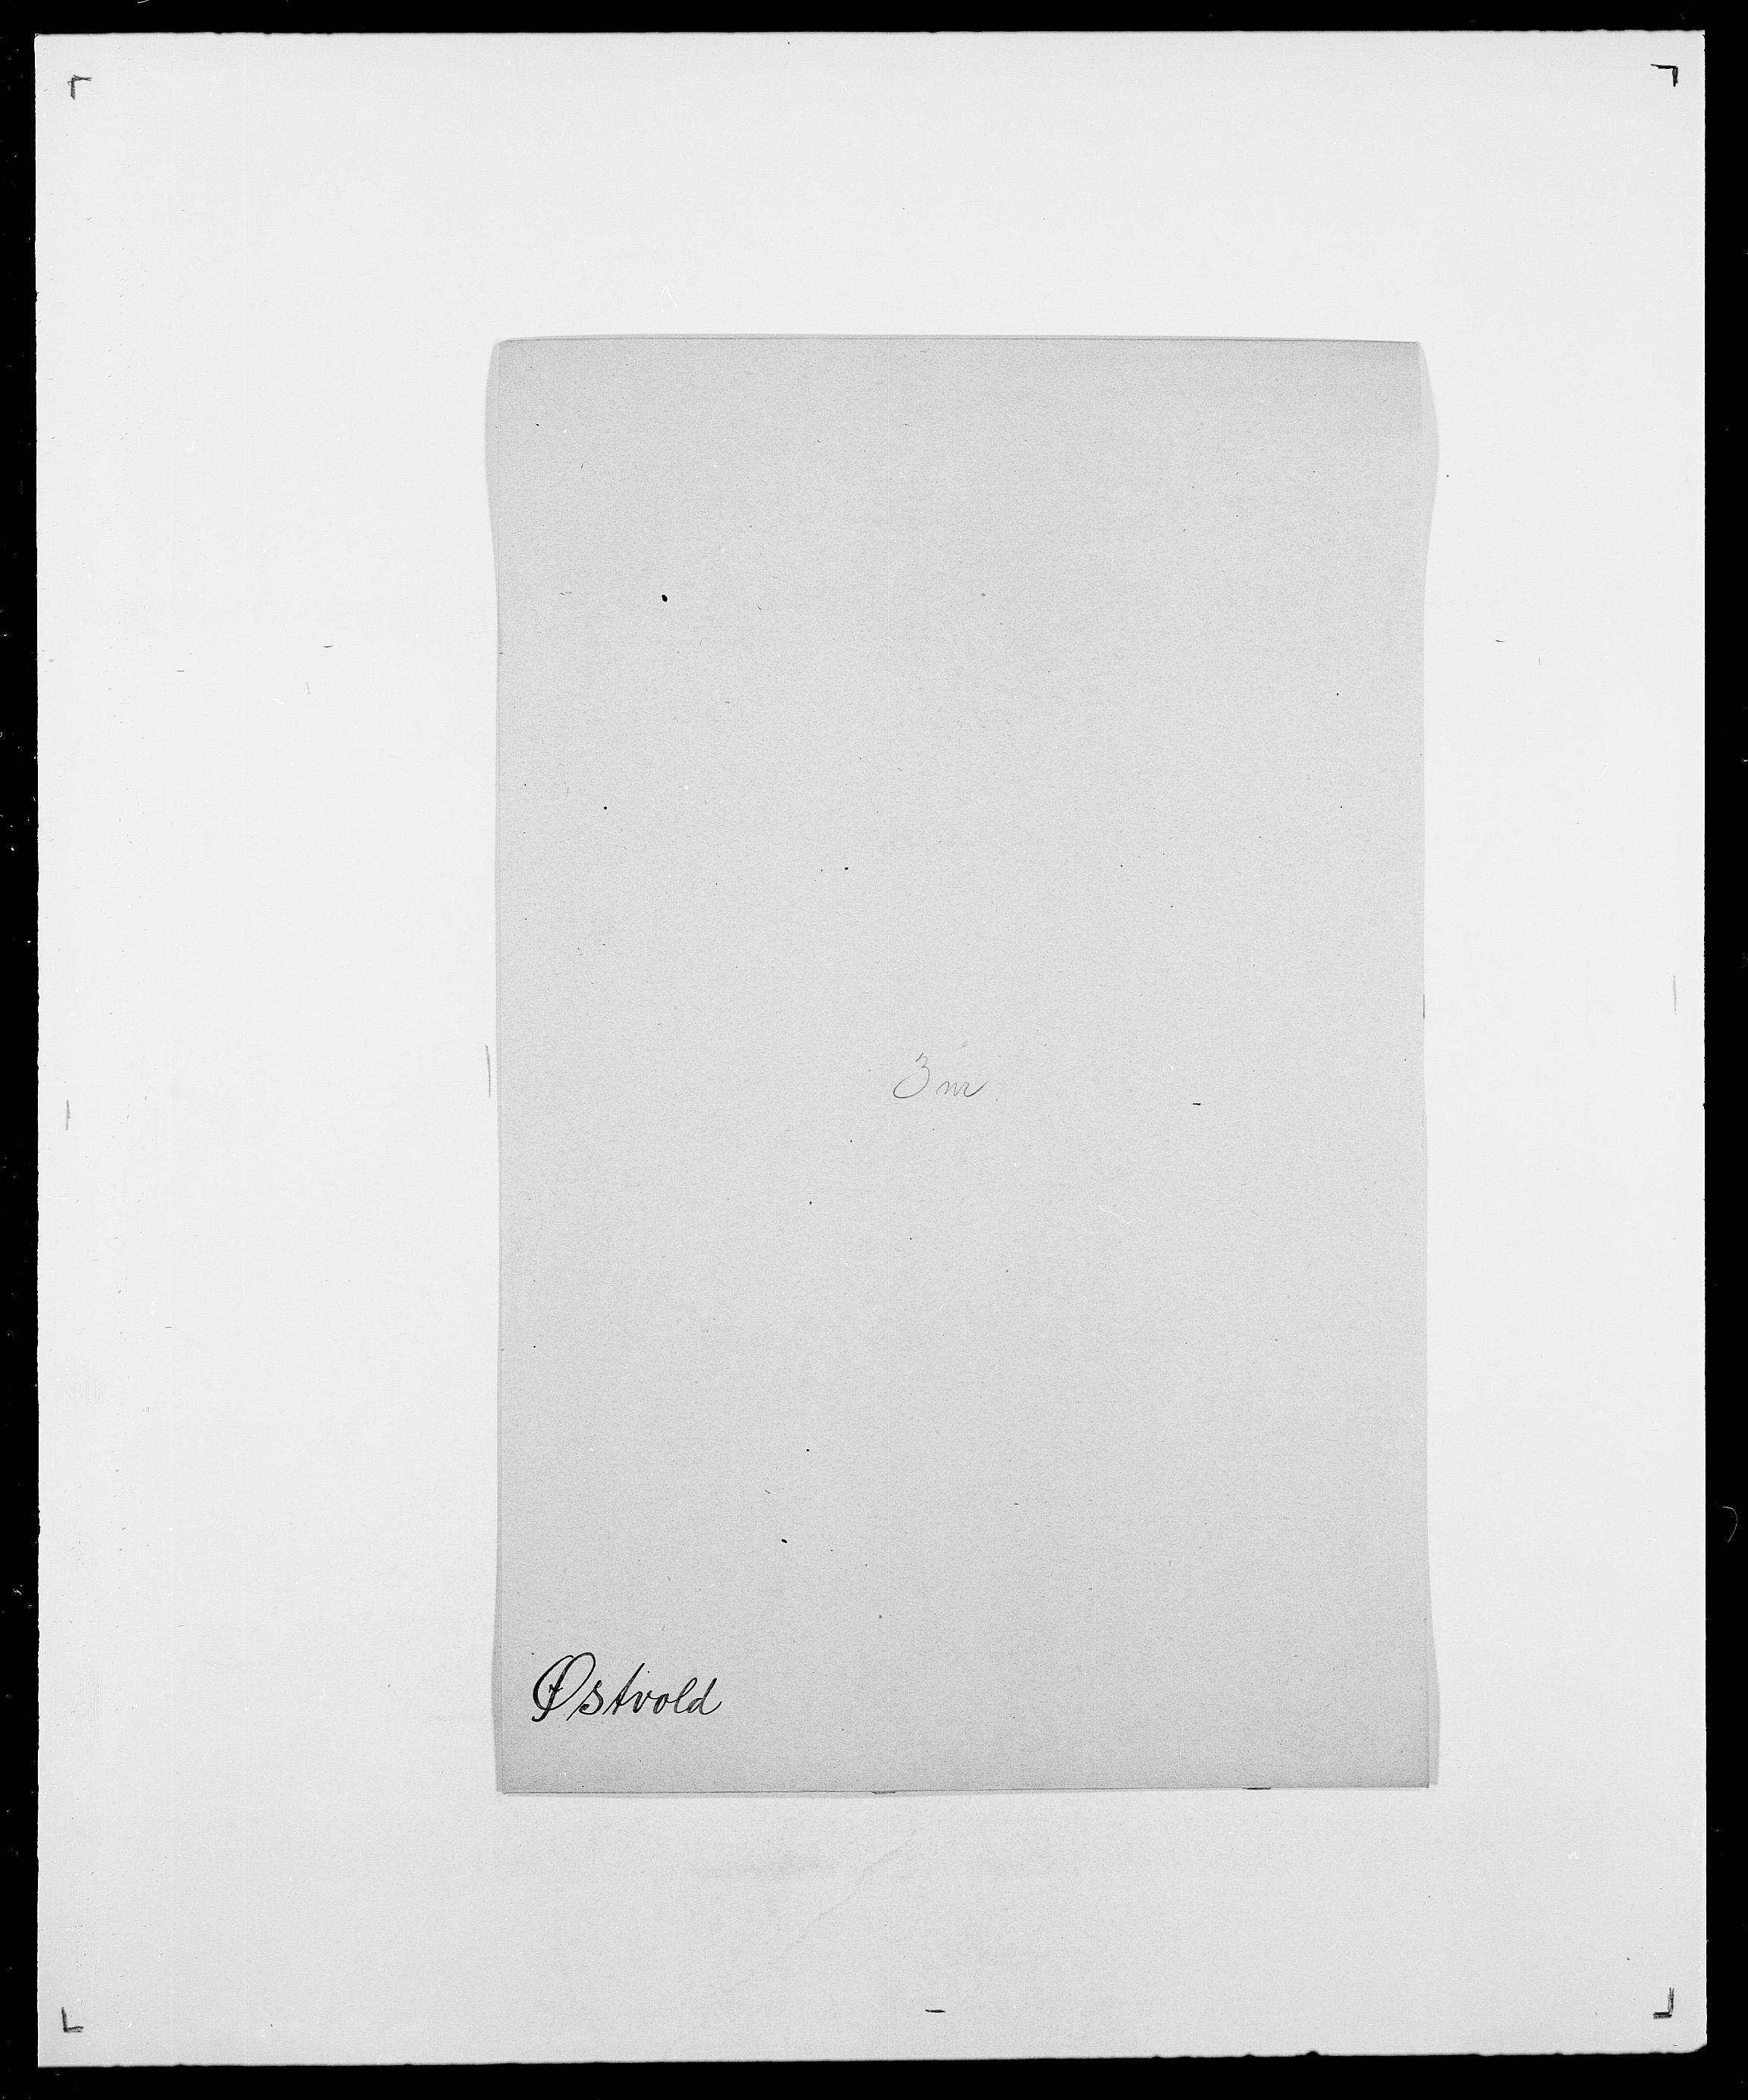 SAO, Delgobe, Charles Antoine - samling, D/Da/L0043: Wulfsberg - v. Zanten, s. 374